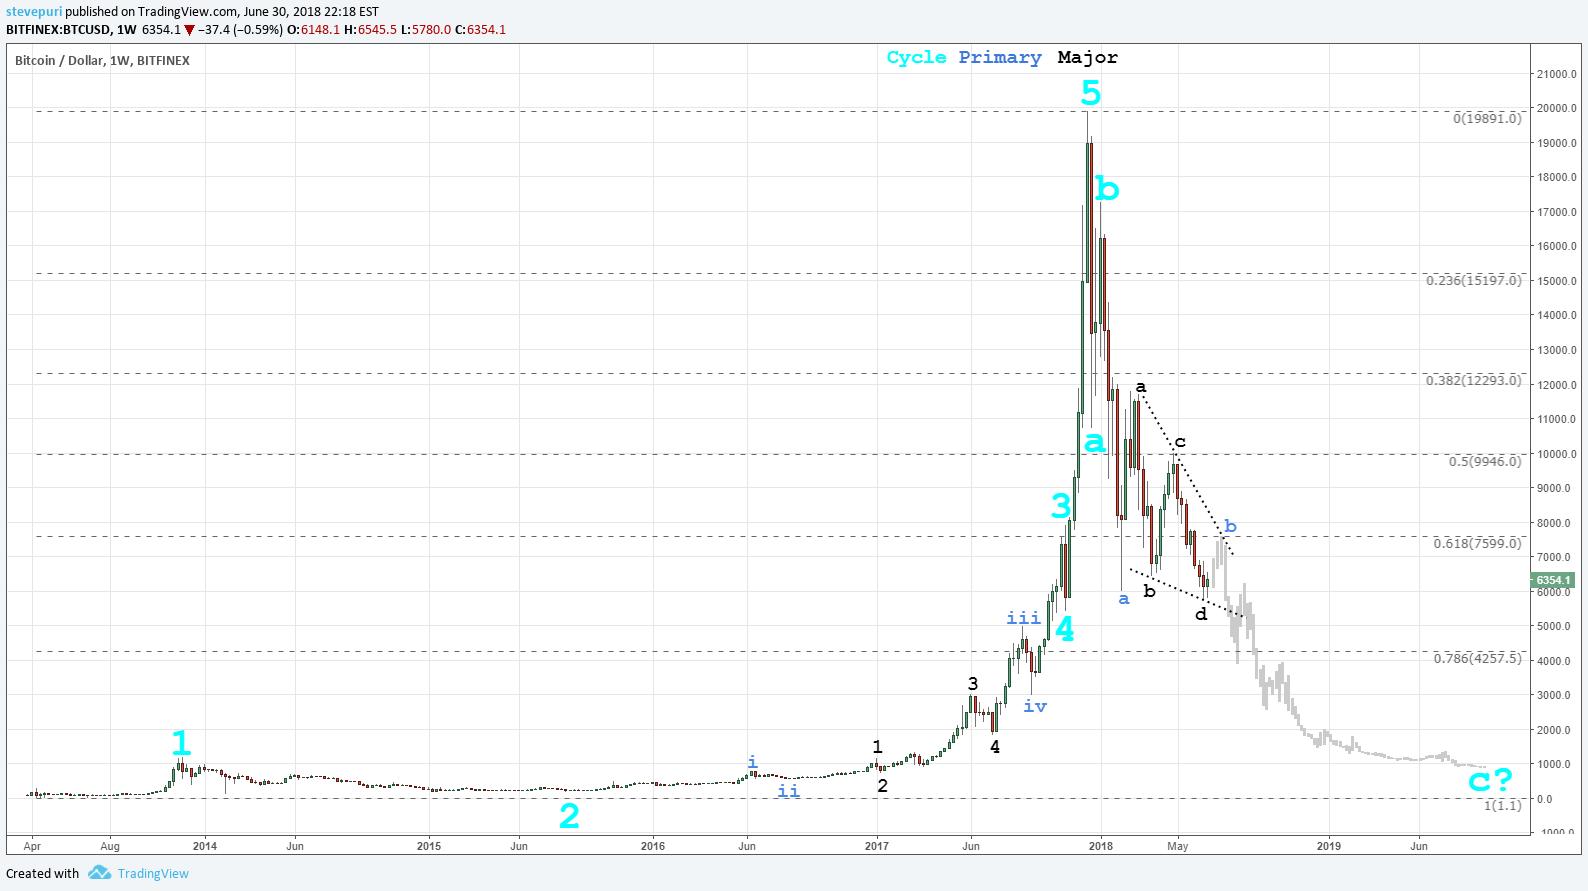 2018 Cryptocurrency Crash Elliott Wave For Bitfinex Btcusd By Stevepuri Tradingview